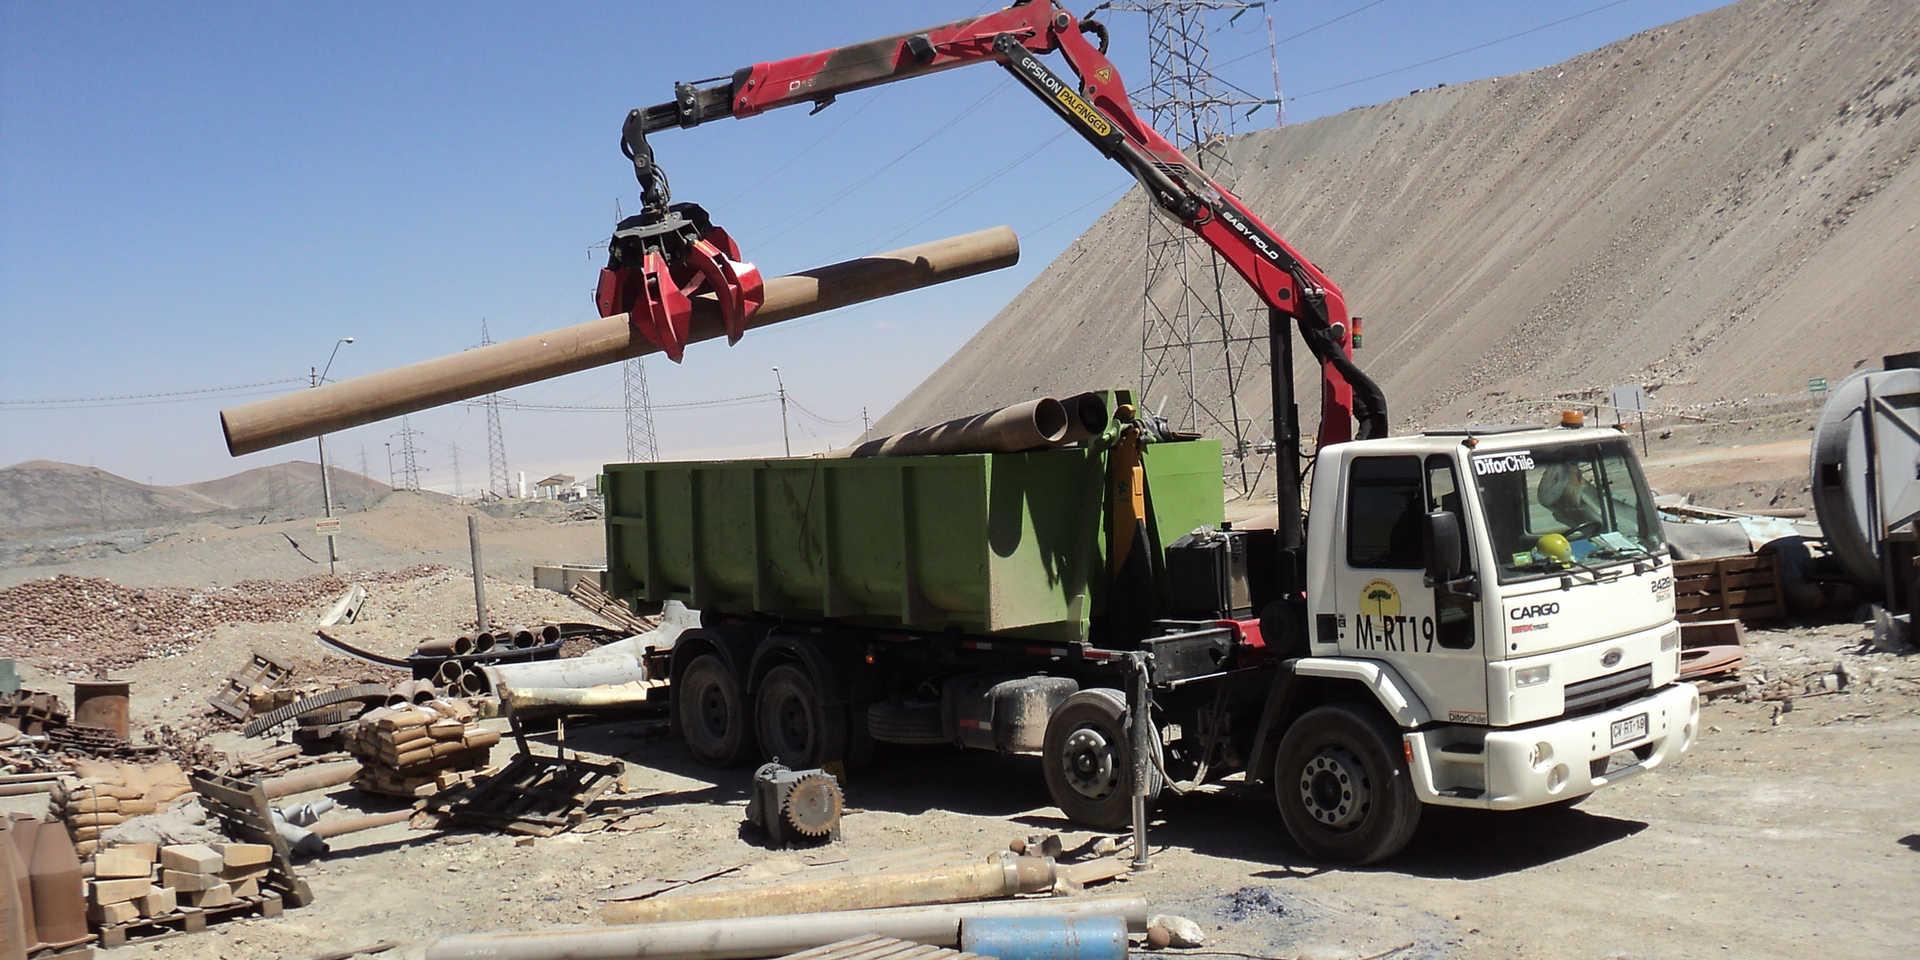 Limpiando Patio de Salvataje Codelco Chuquicamata